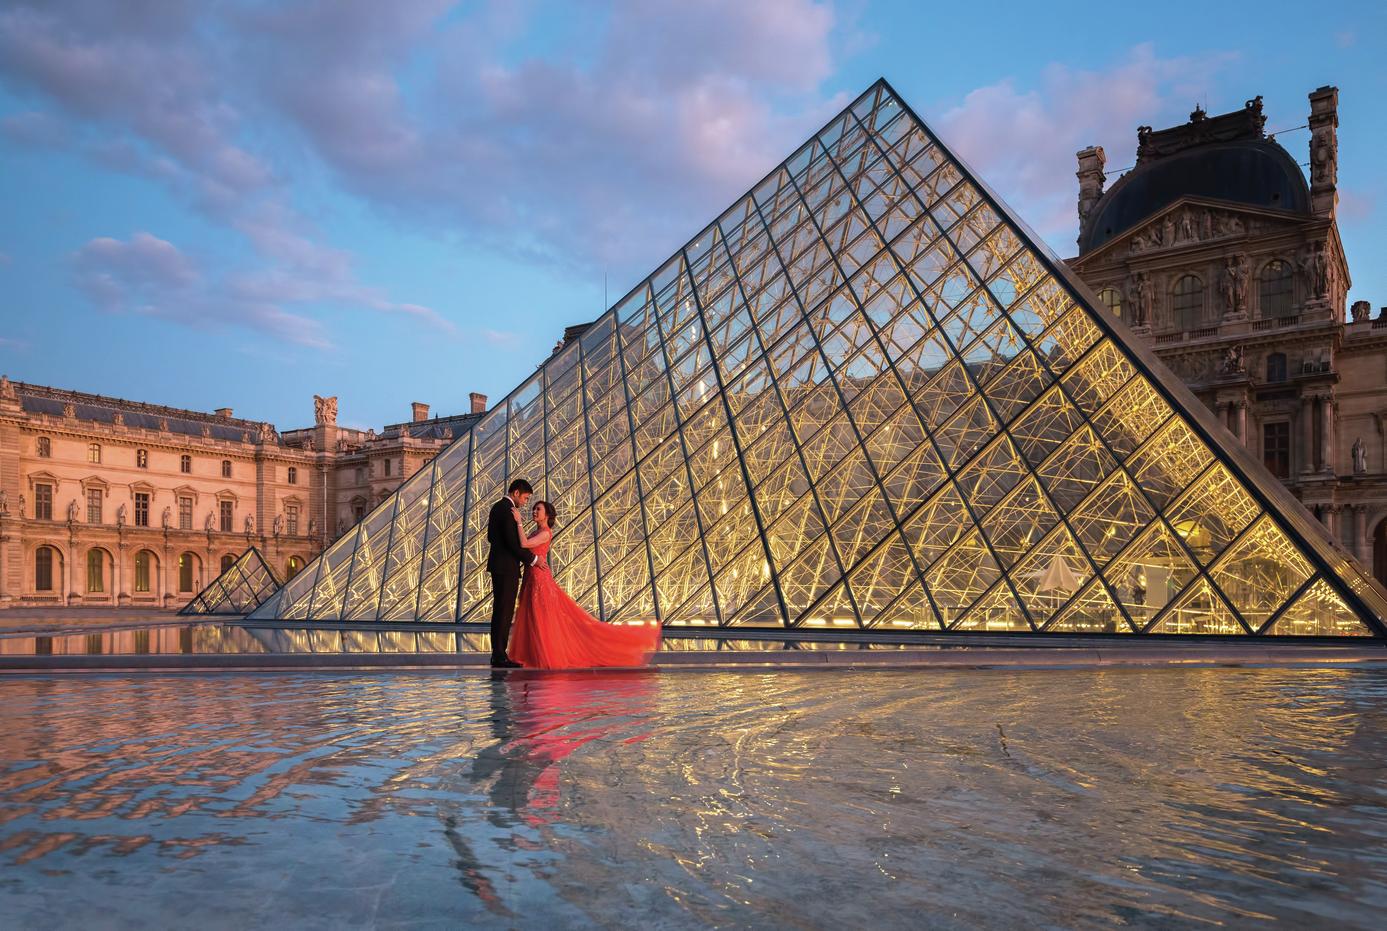 Real Weddings: Vicki Belo And Hayden Kho Jr's Parisian Fairytale